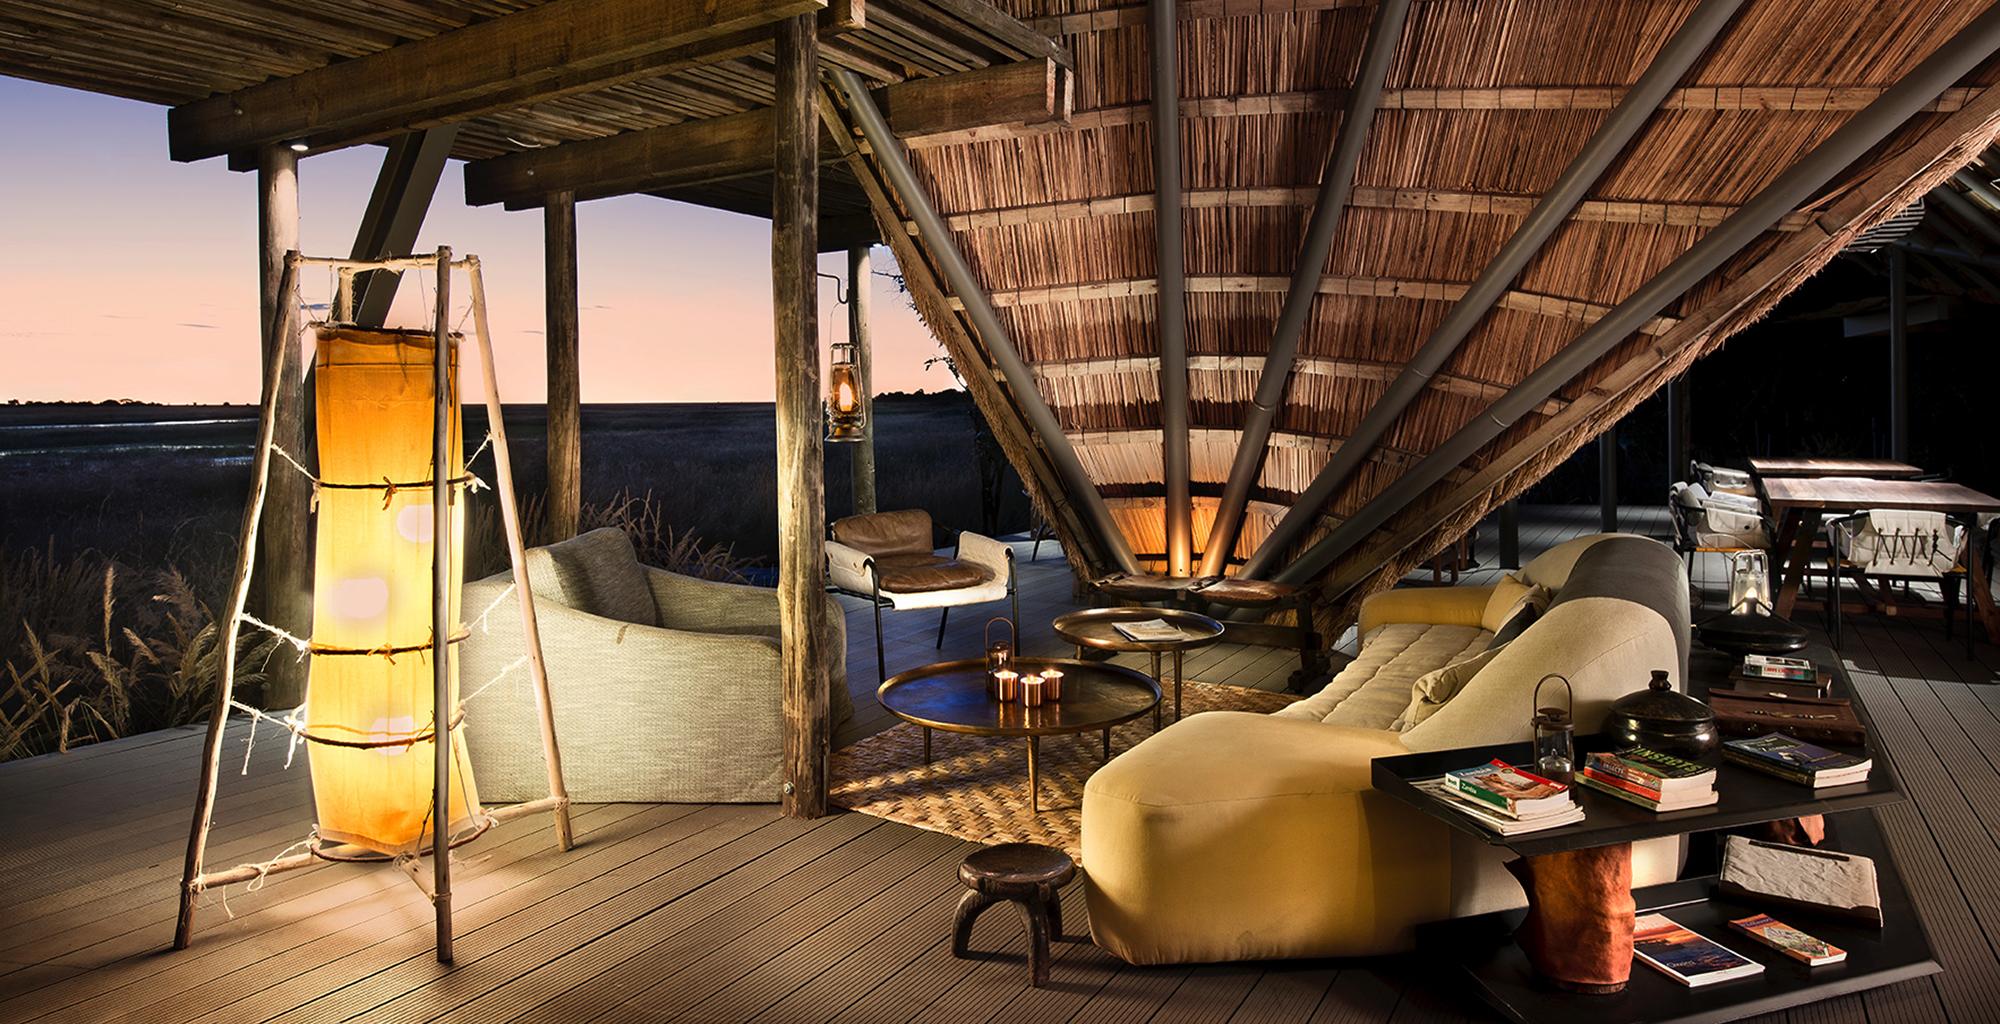 Zambia-King-Lewanika-Lounge